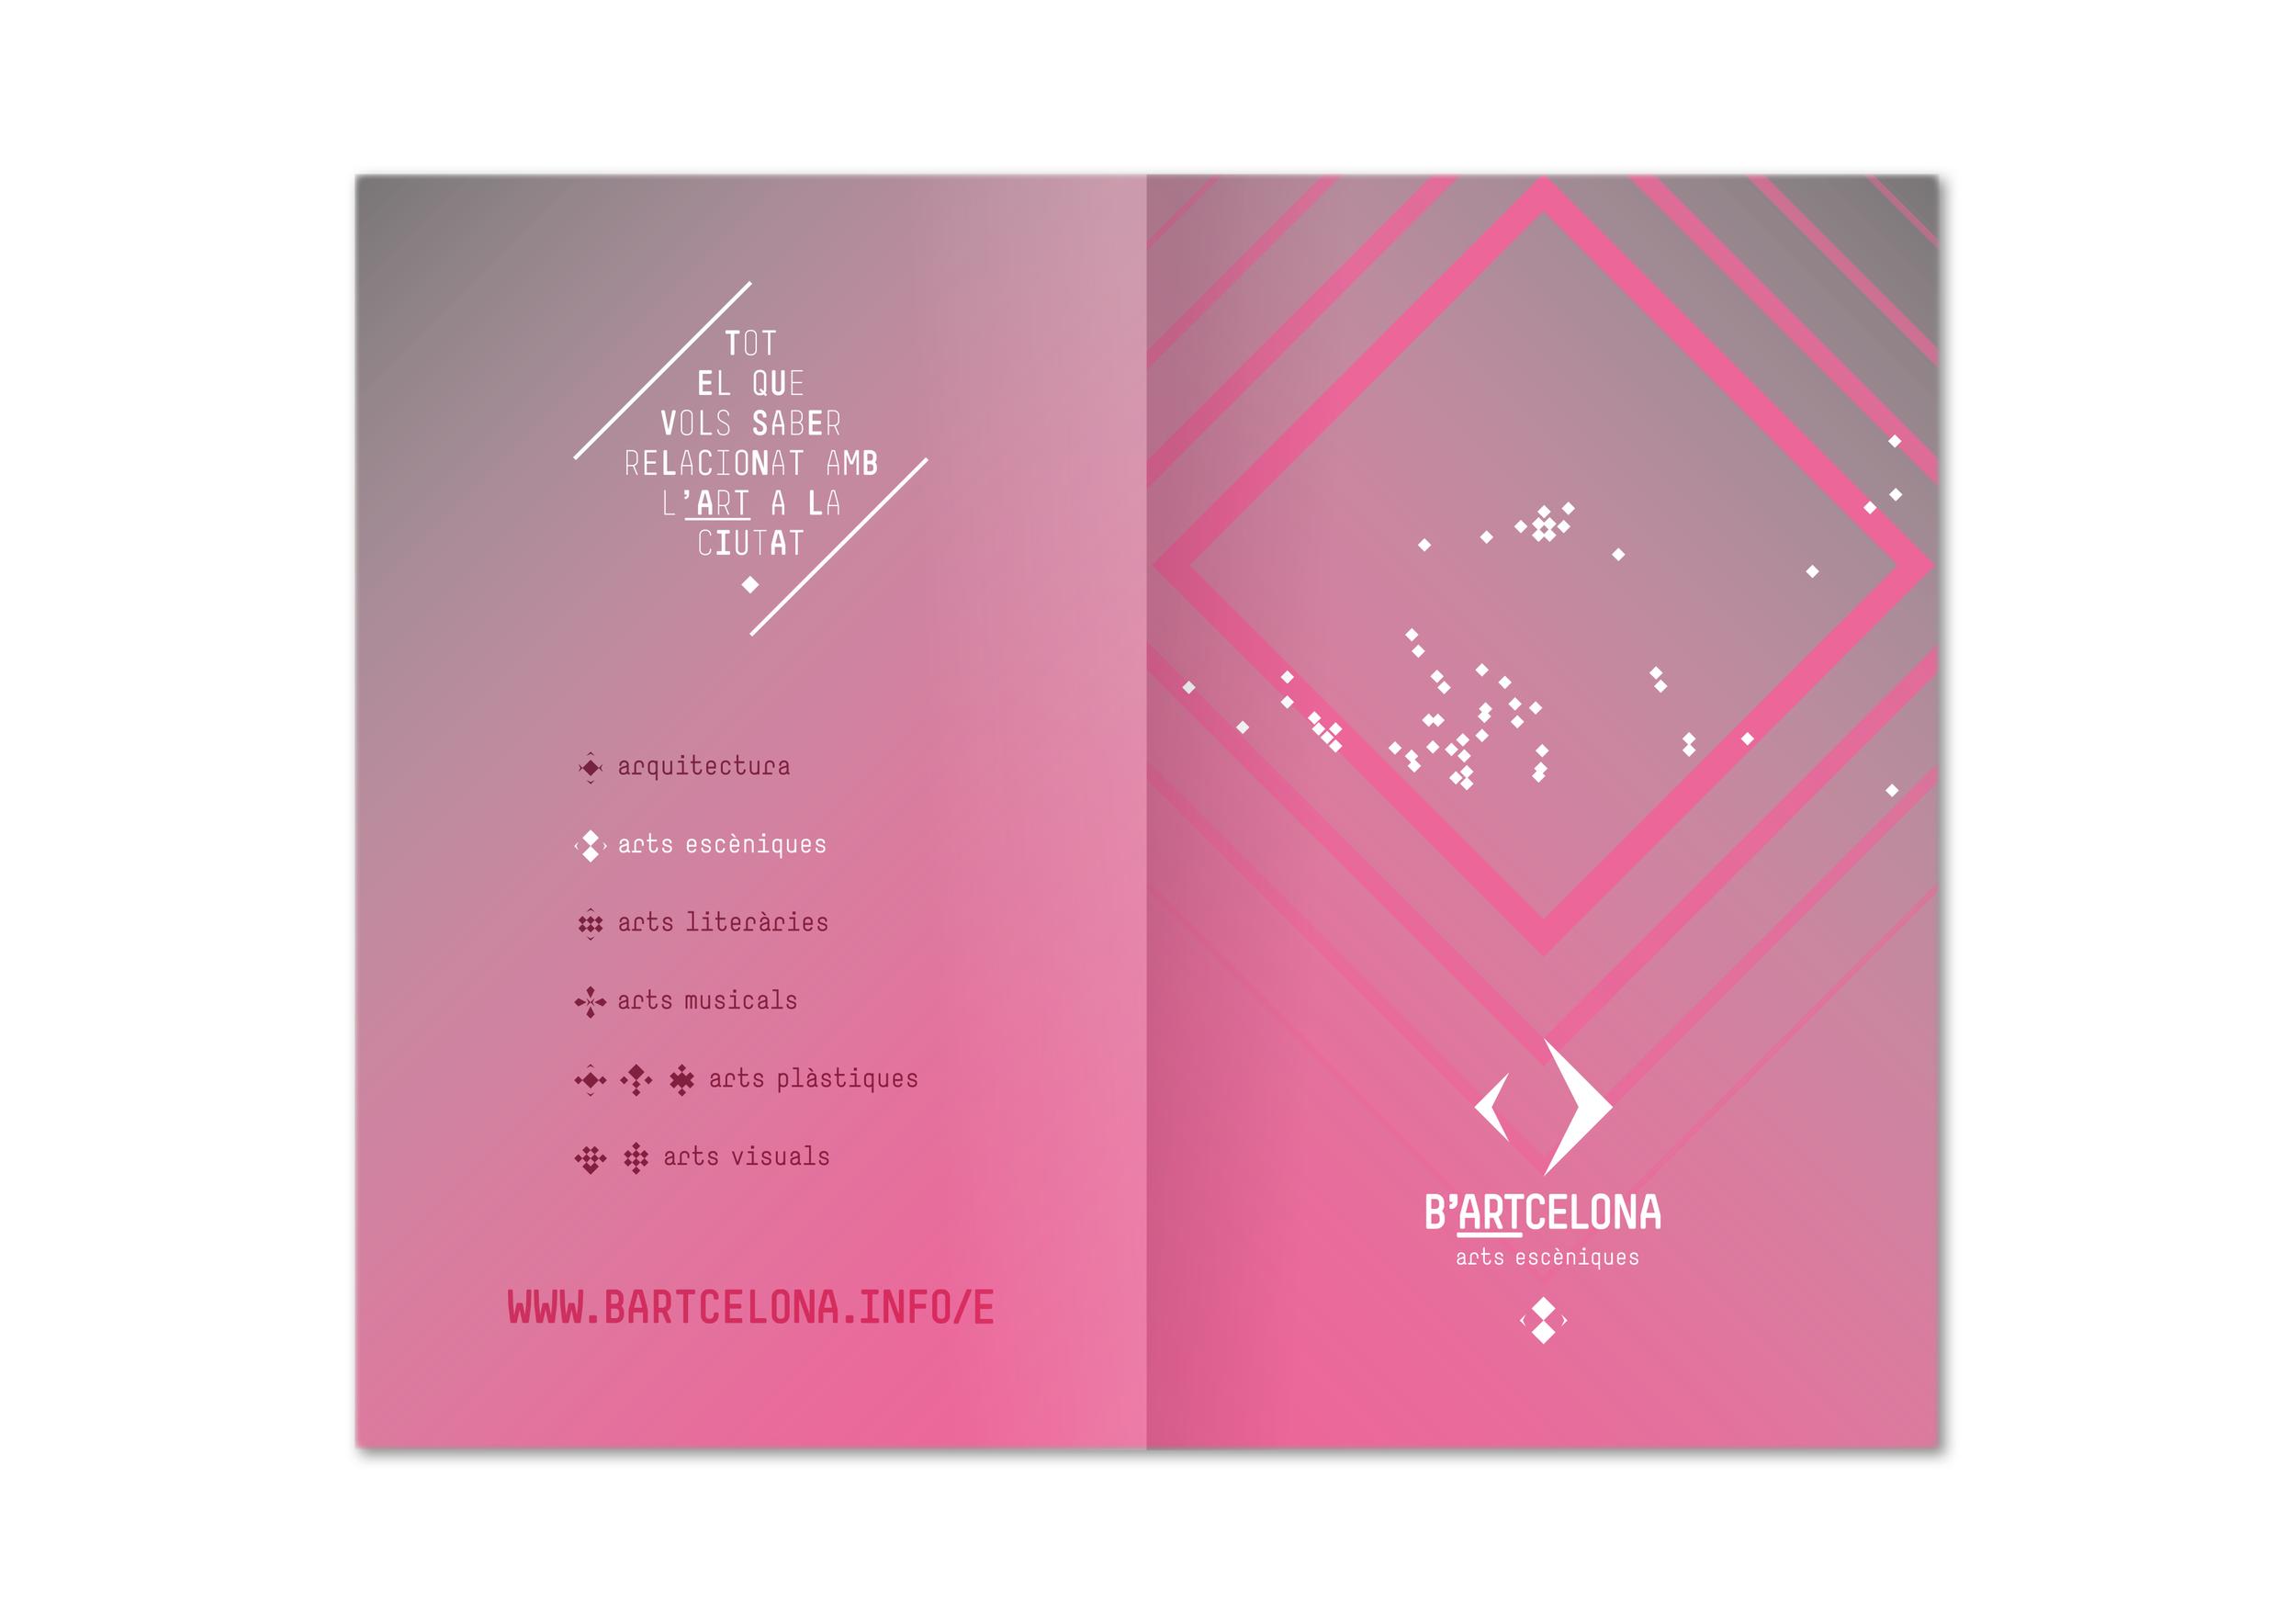 bartcelona_cover_bk2_victorgc.png